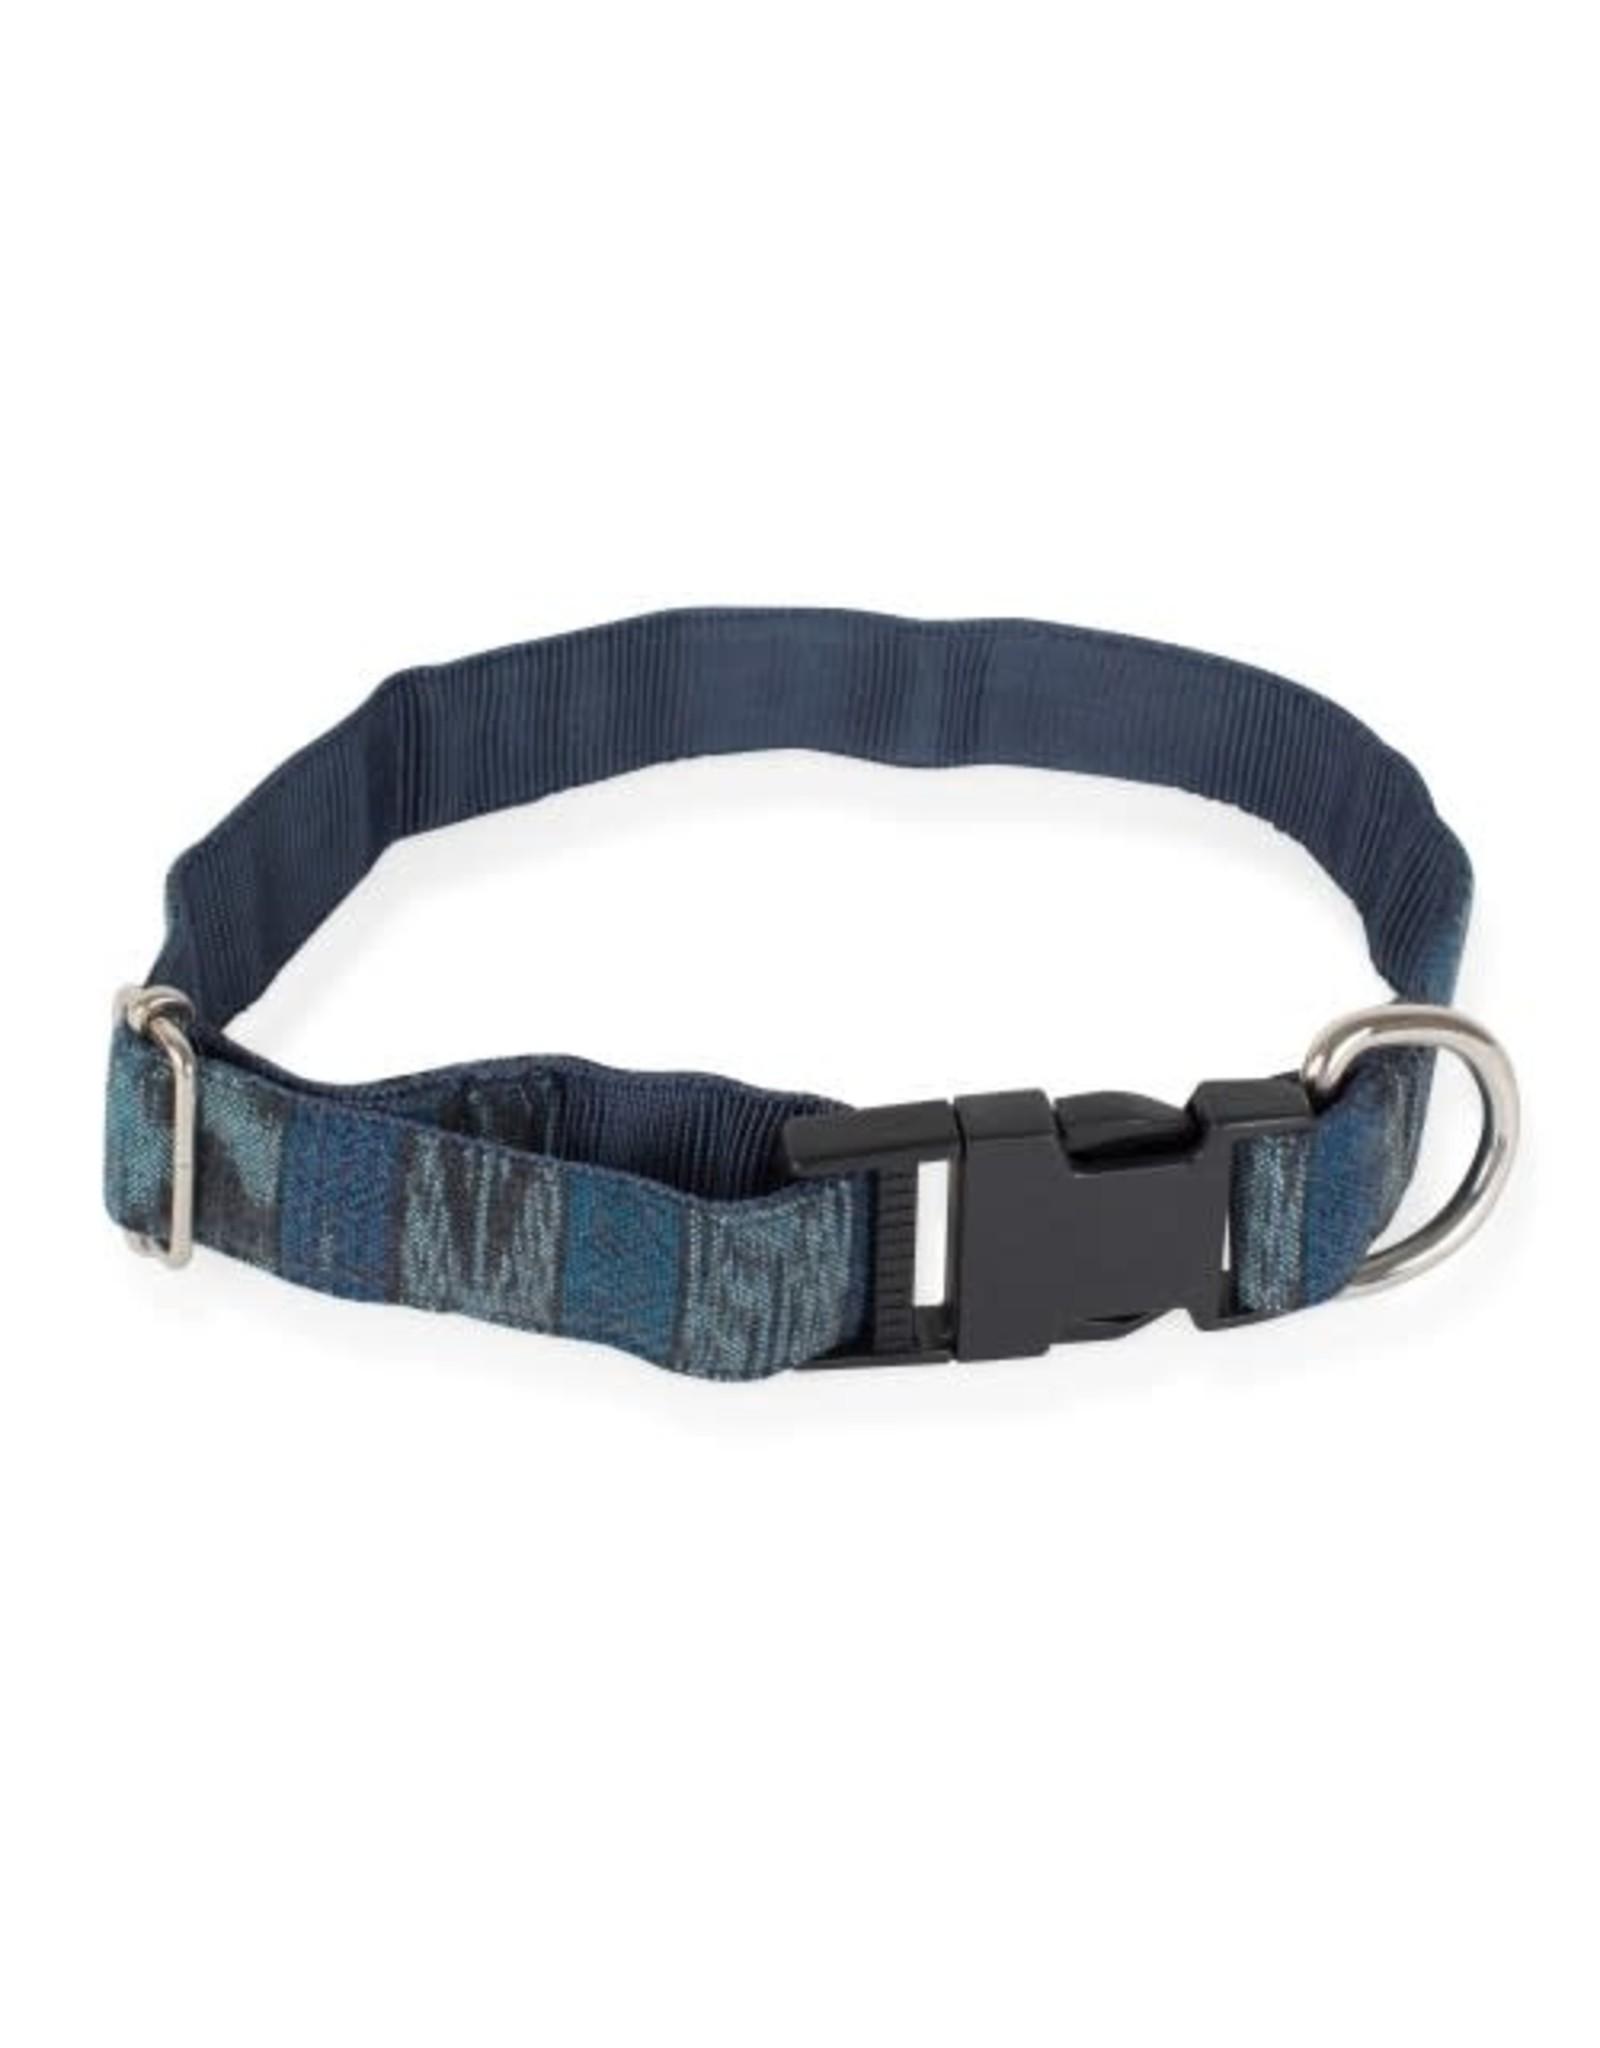 New Trick Dog Collar